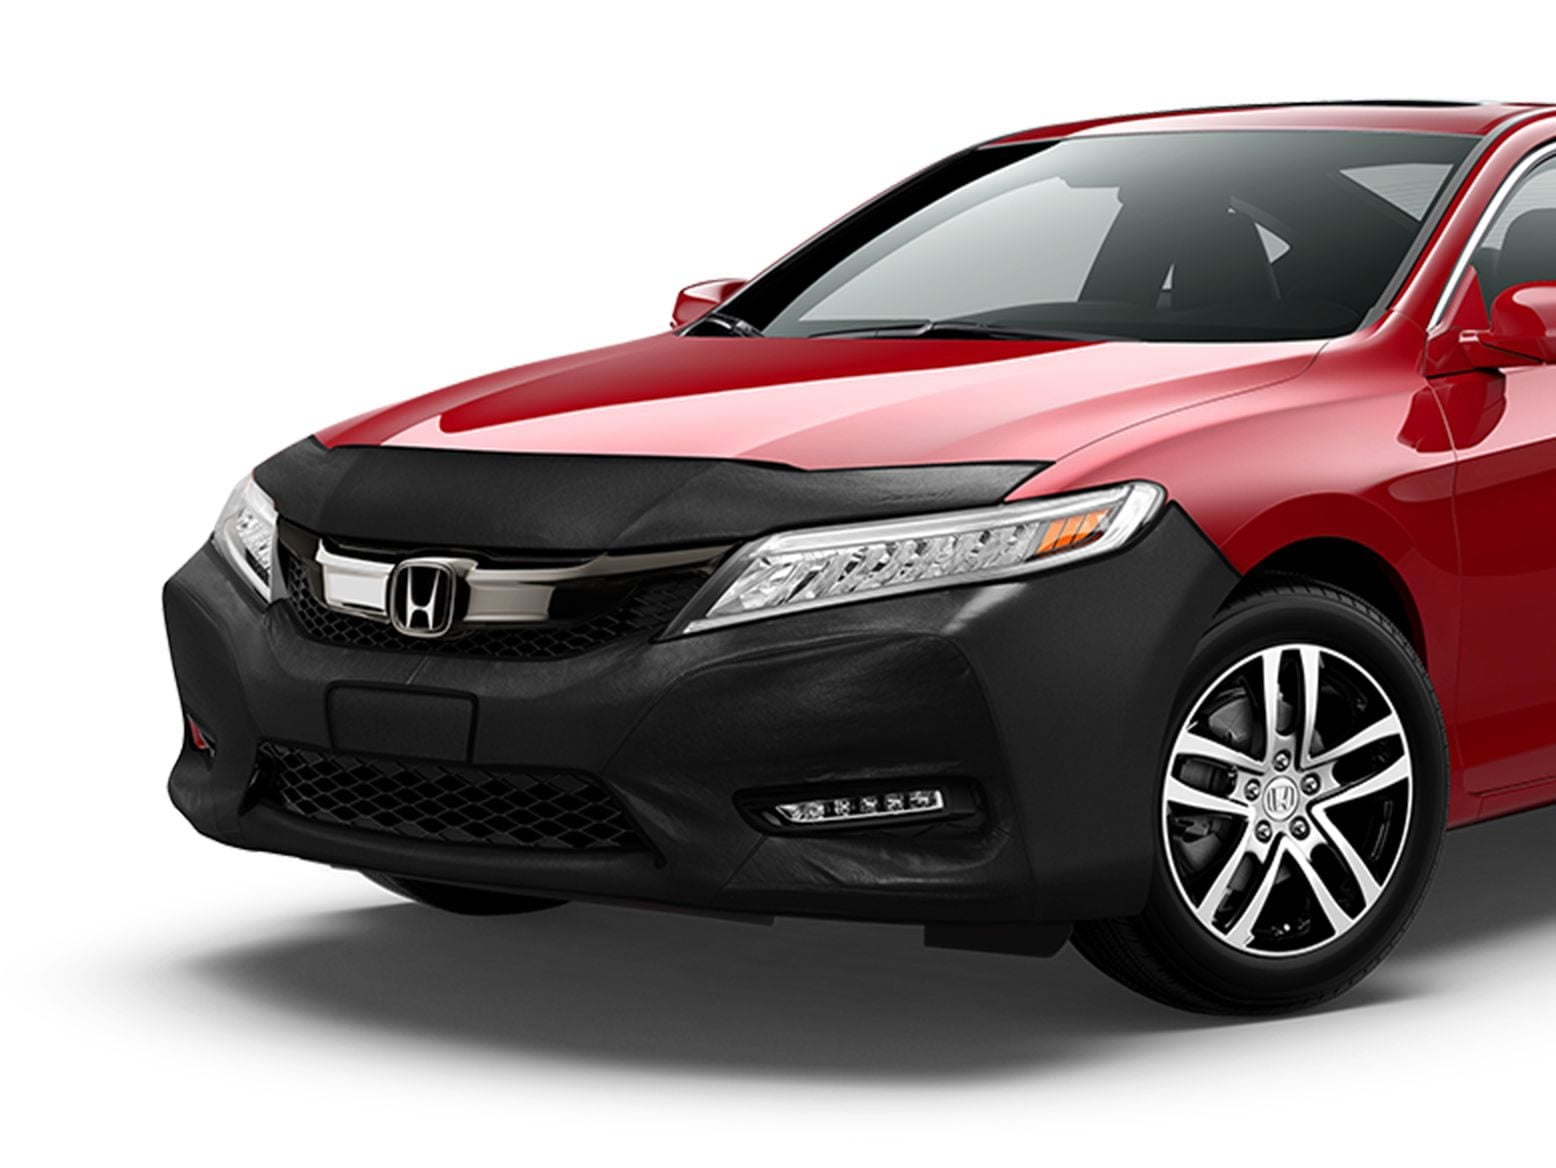 Honda online store : 2017 ACCORD NOSE MASK